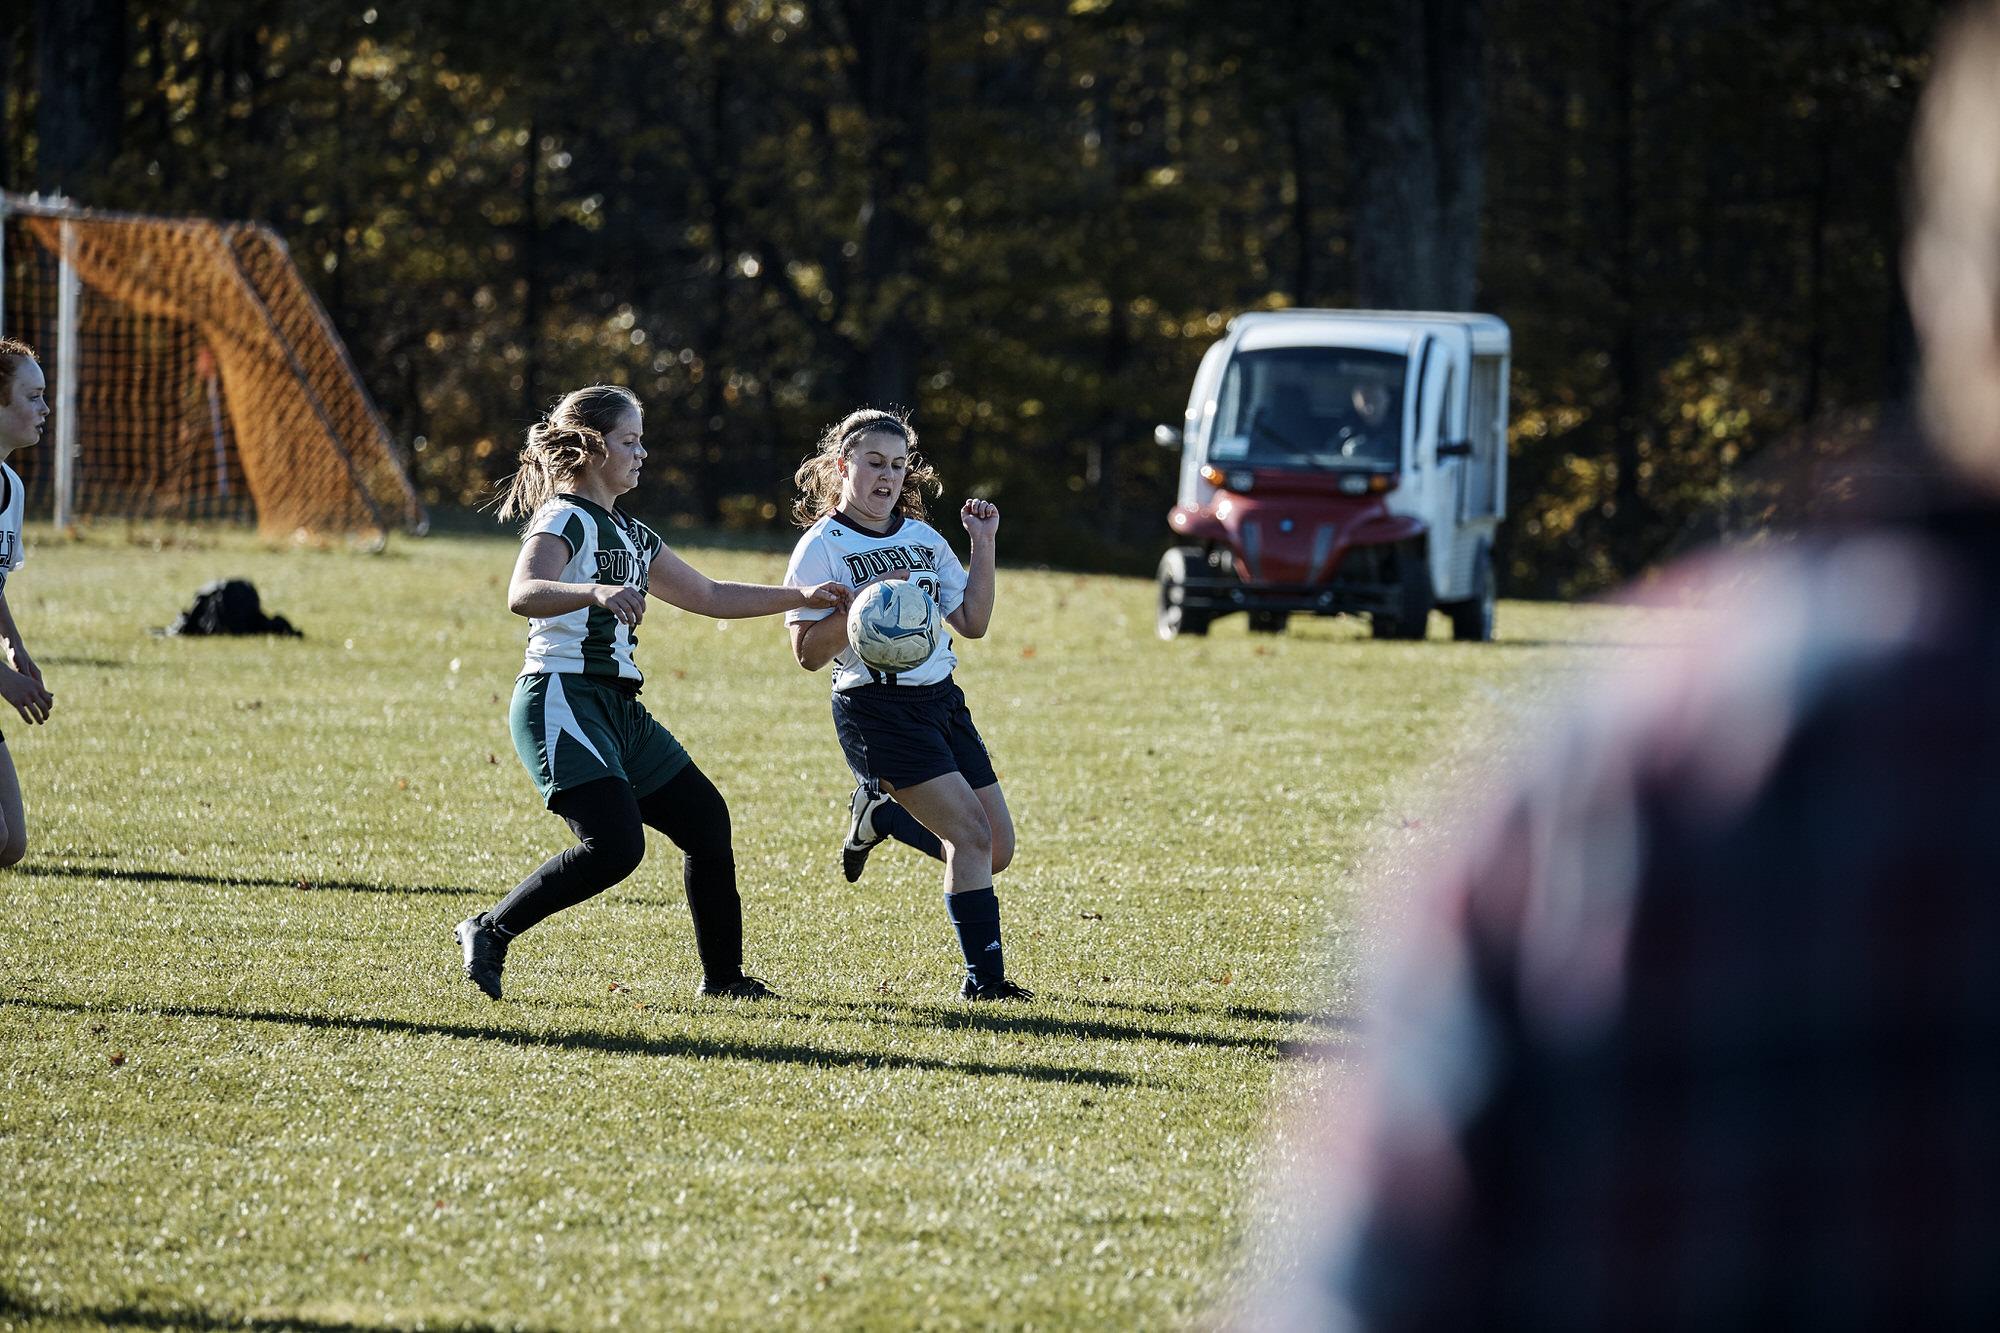 Girls Varsity Soccer vs. Putney School - October 26, 2018 - 018.jpg